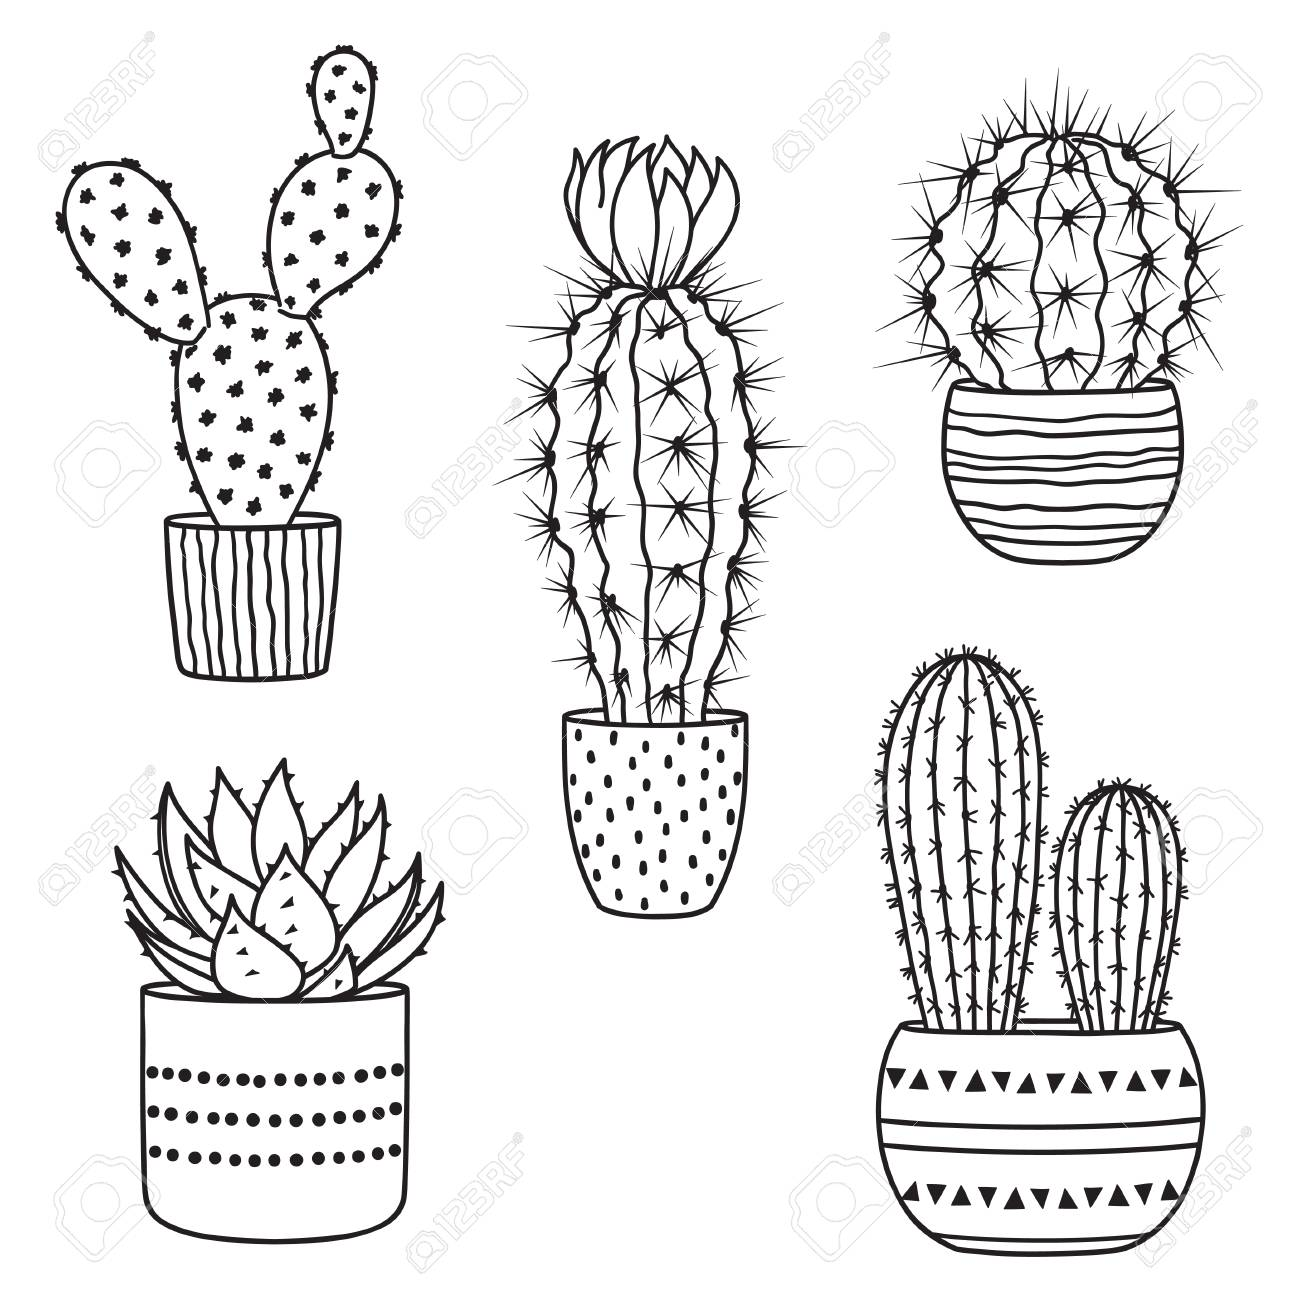 set of hand drawn